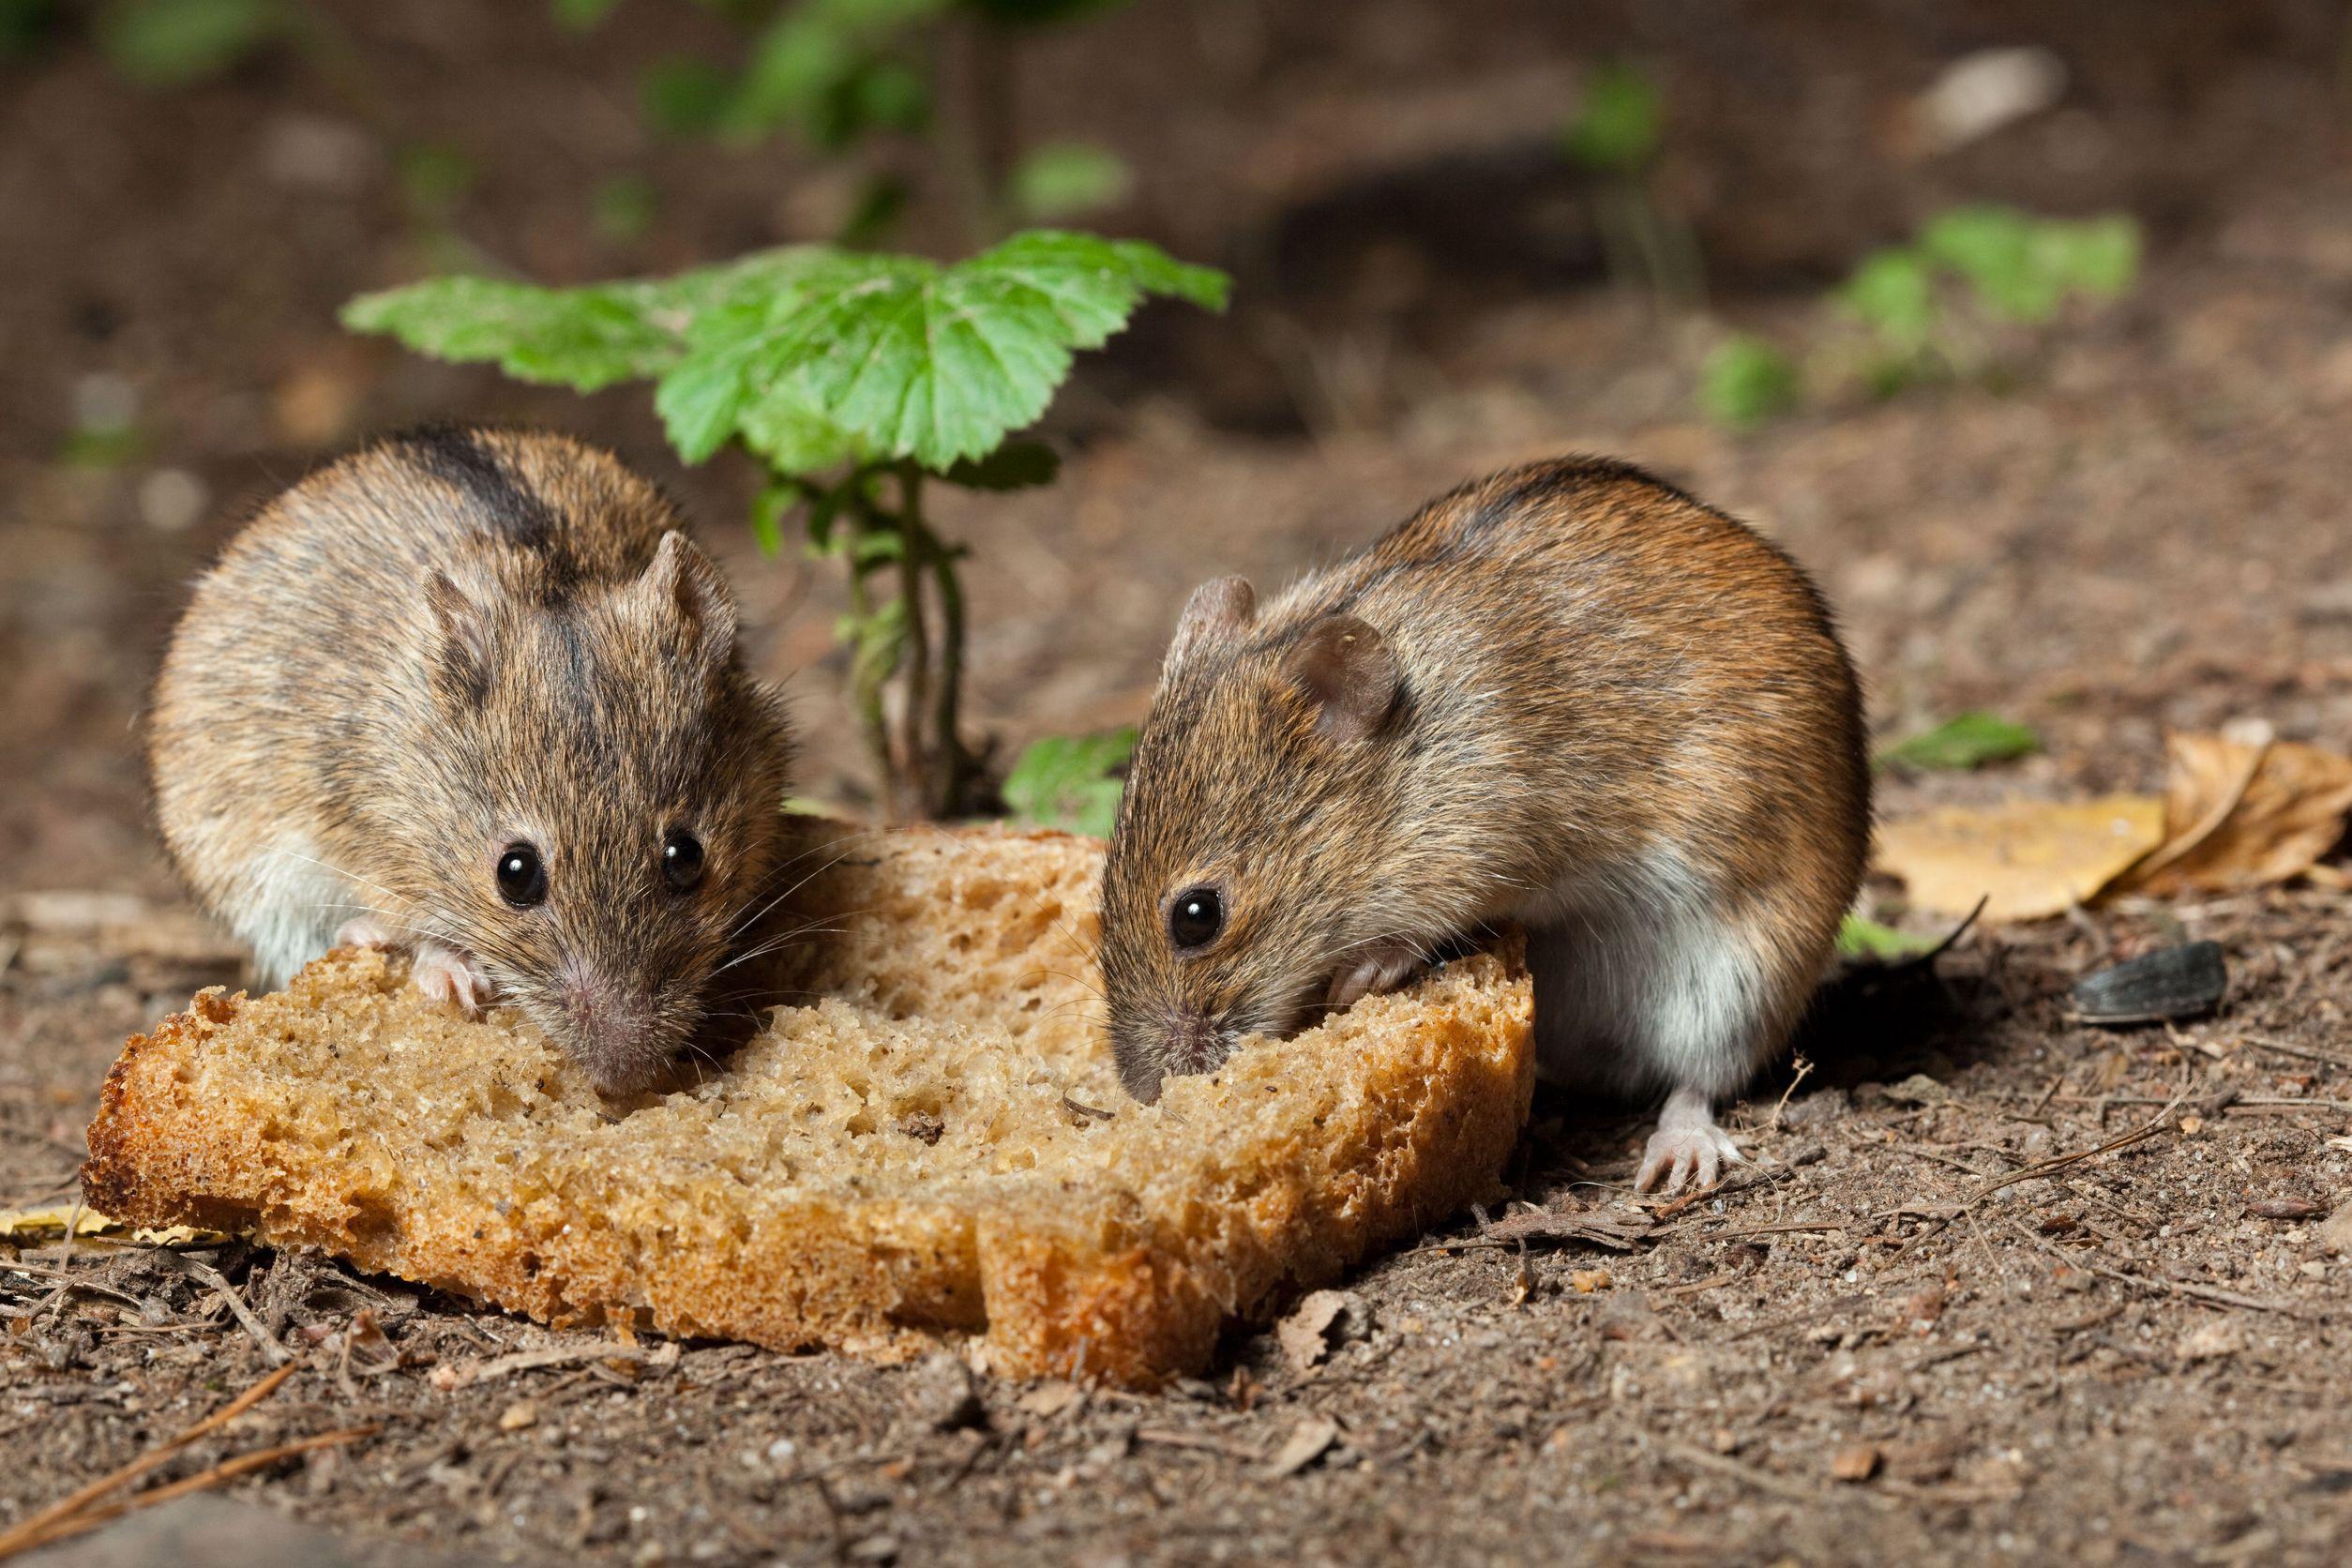 Res: 2508x1672, Animal - Rat Wallpaper